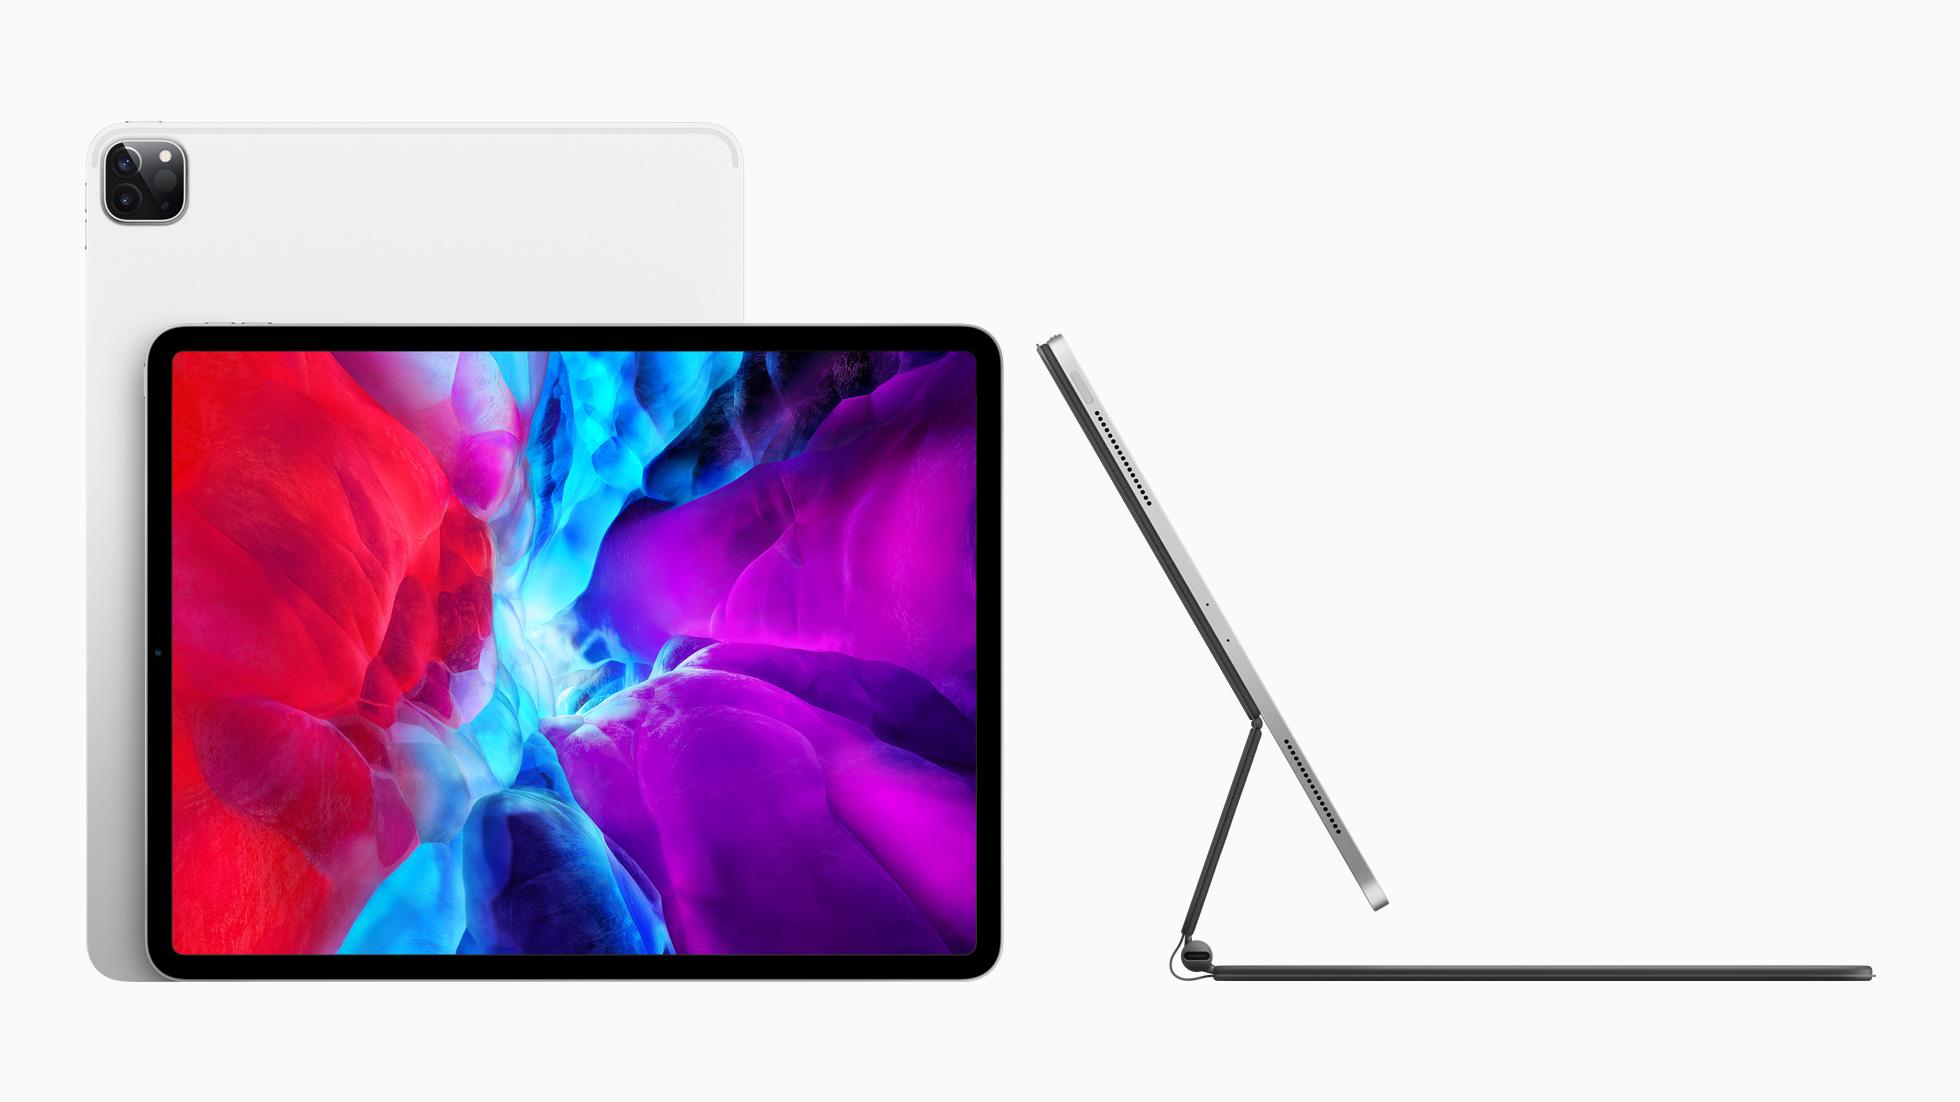 Apple_new-iPad-Pro_03182020_big.jpg.large_2x.jpg (1960×1102)